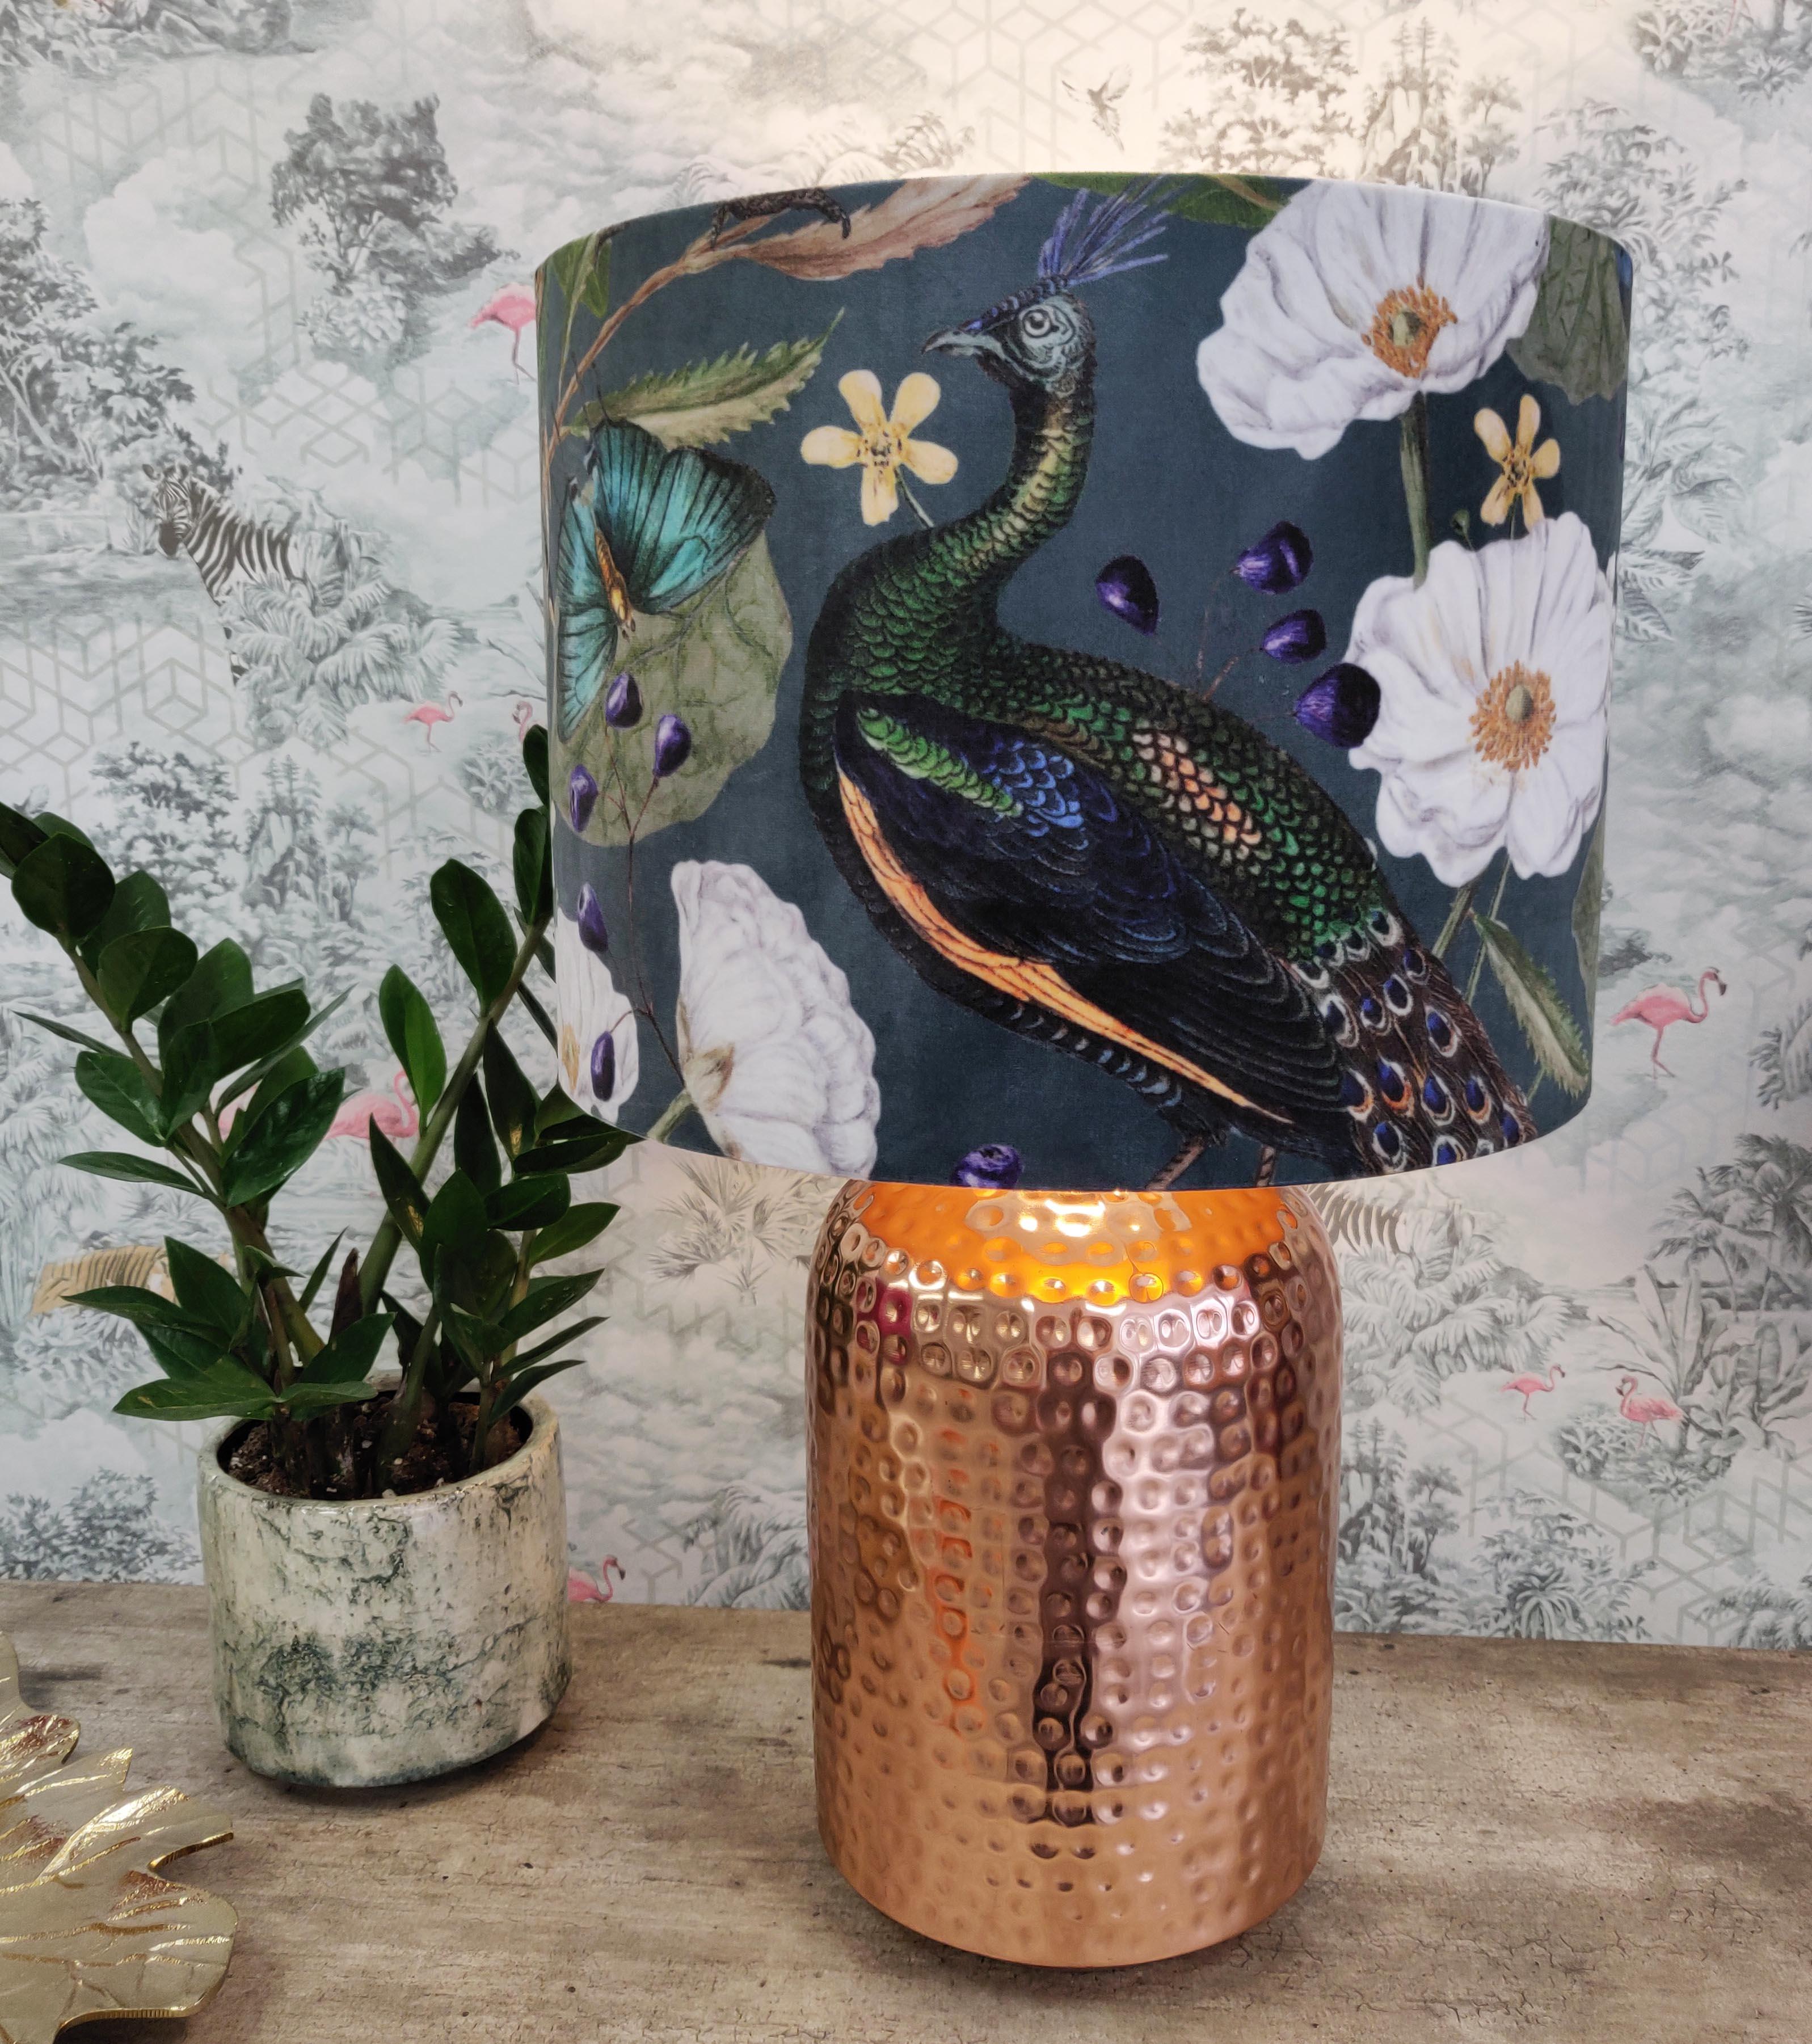 Lampshade in a Velvet Peacock Design